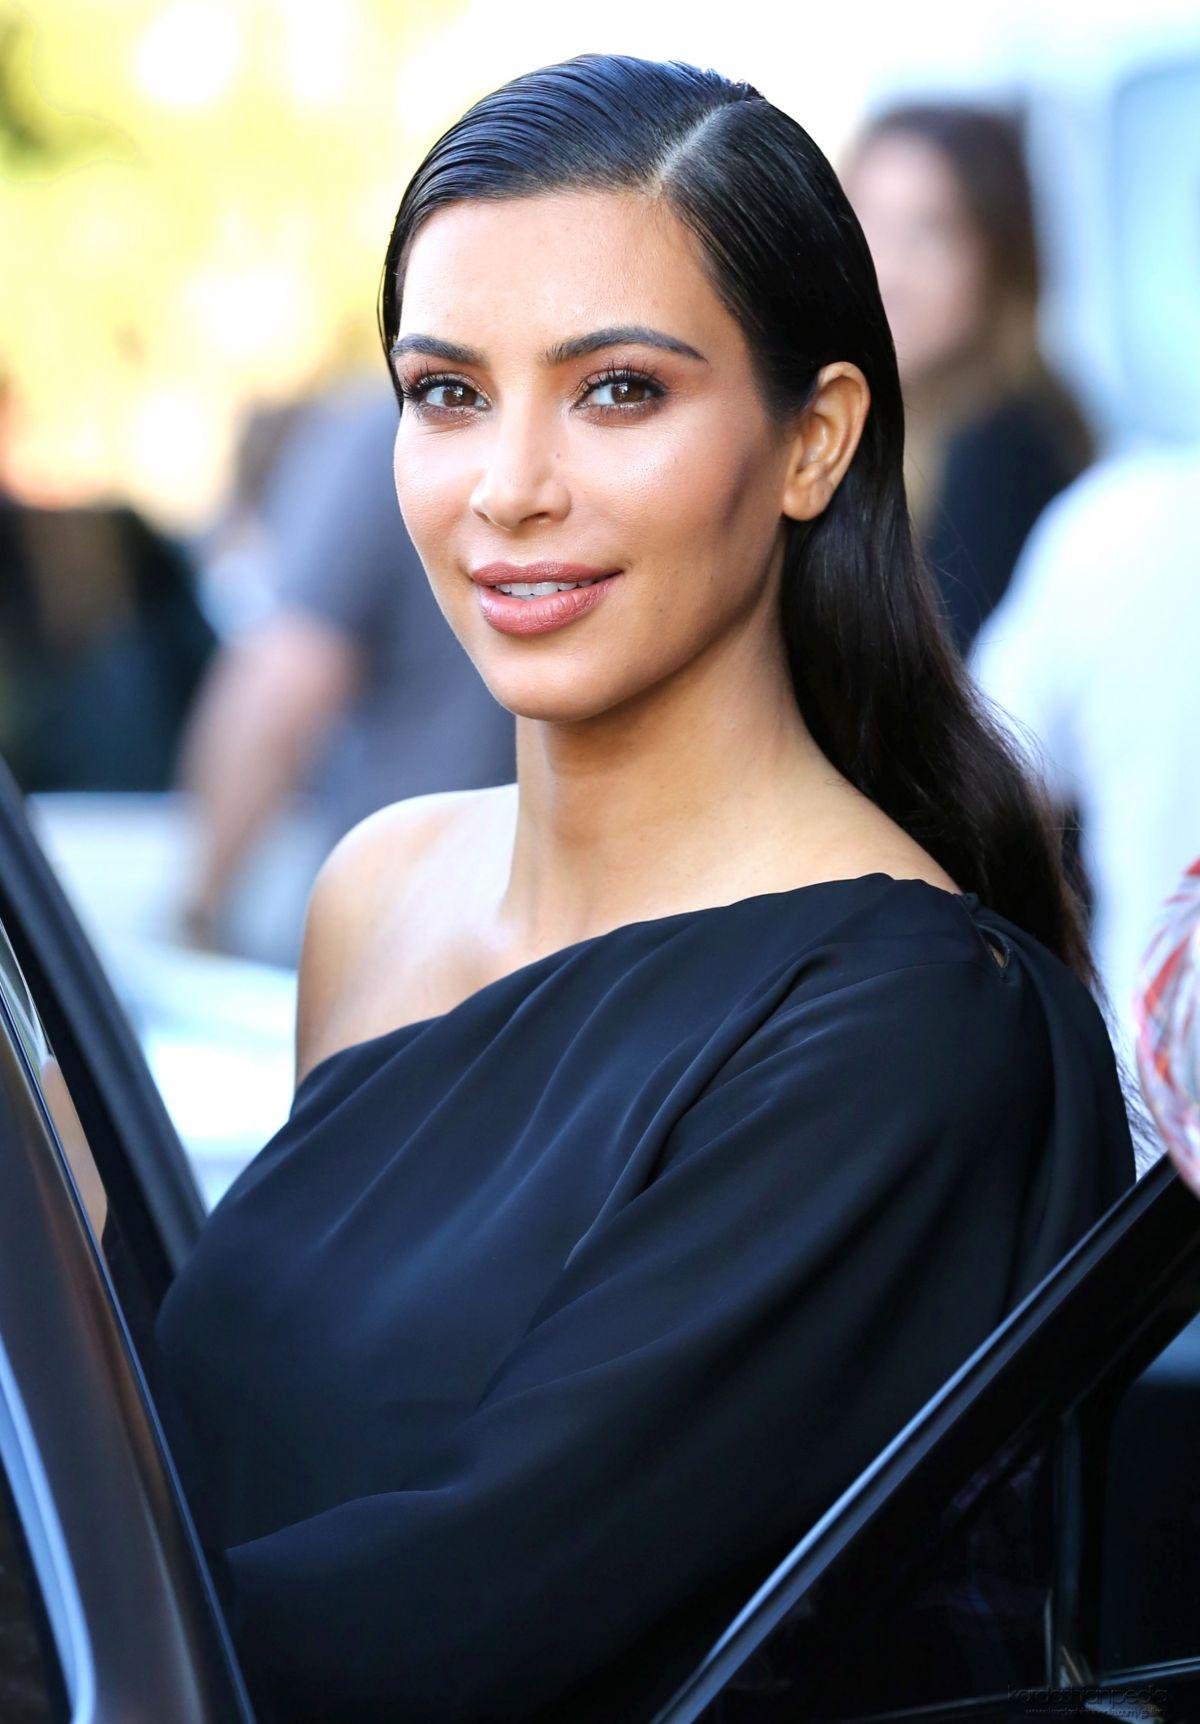 KIM KARDASHIAN Leaves a Photoshoot in Calabasas - HawtCelebs Kim Kardashian